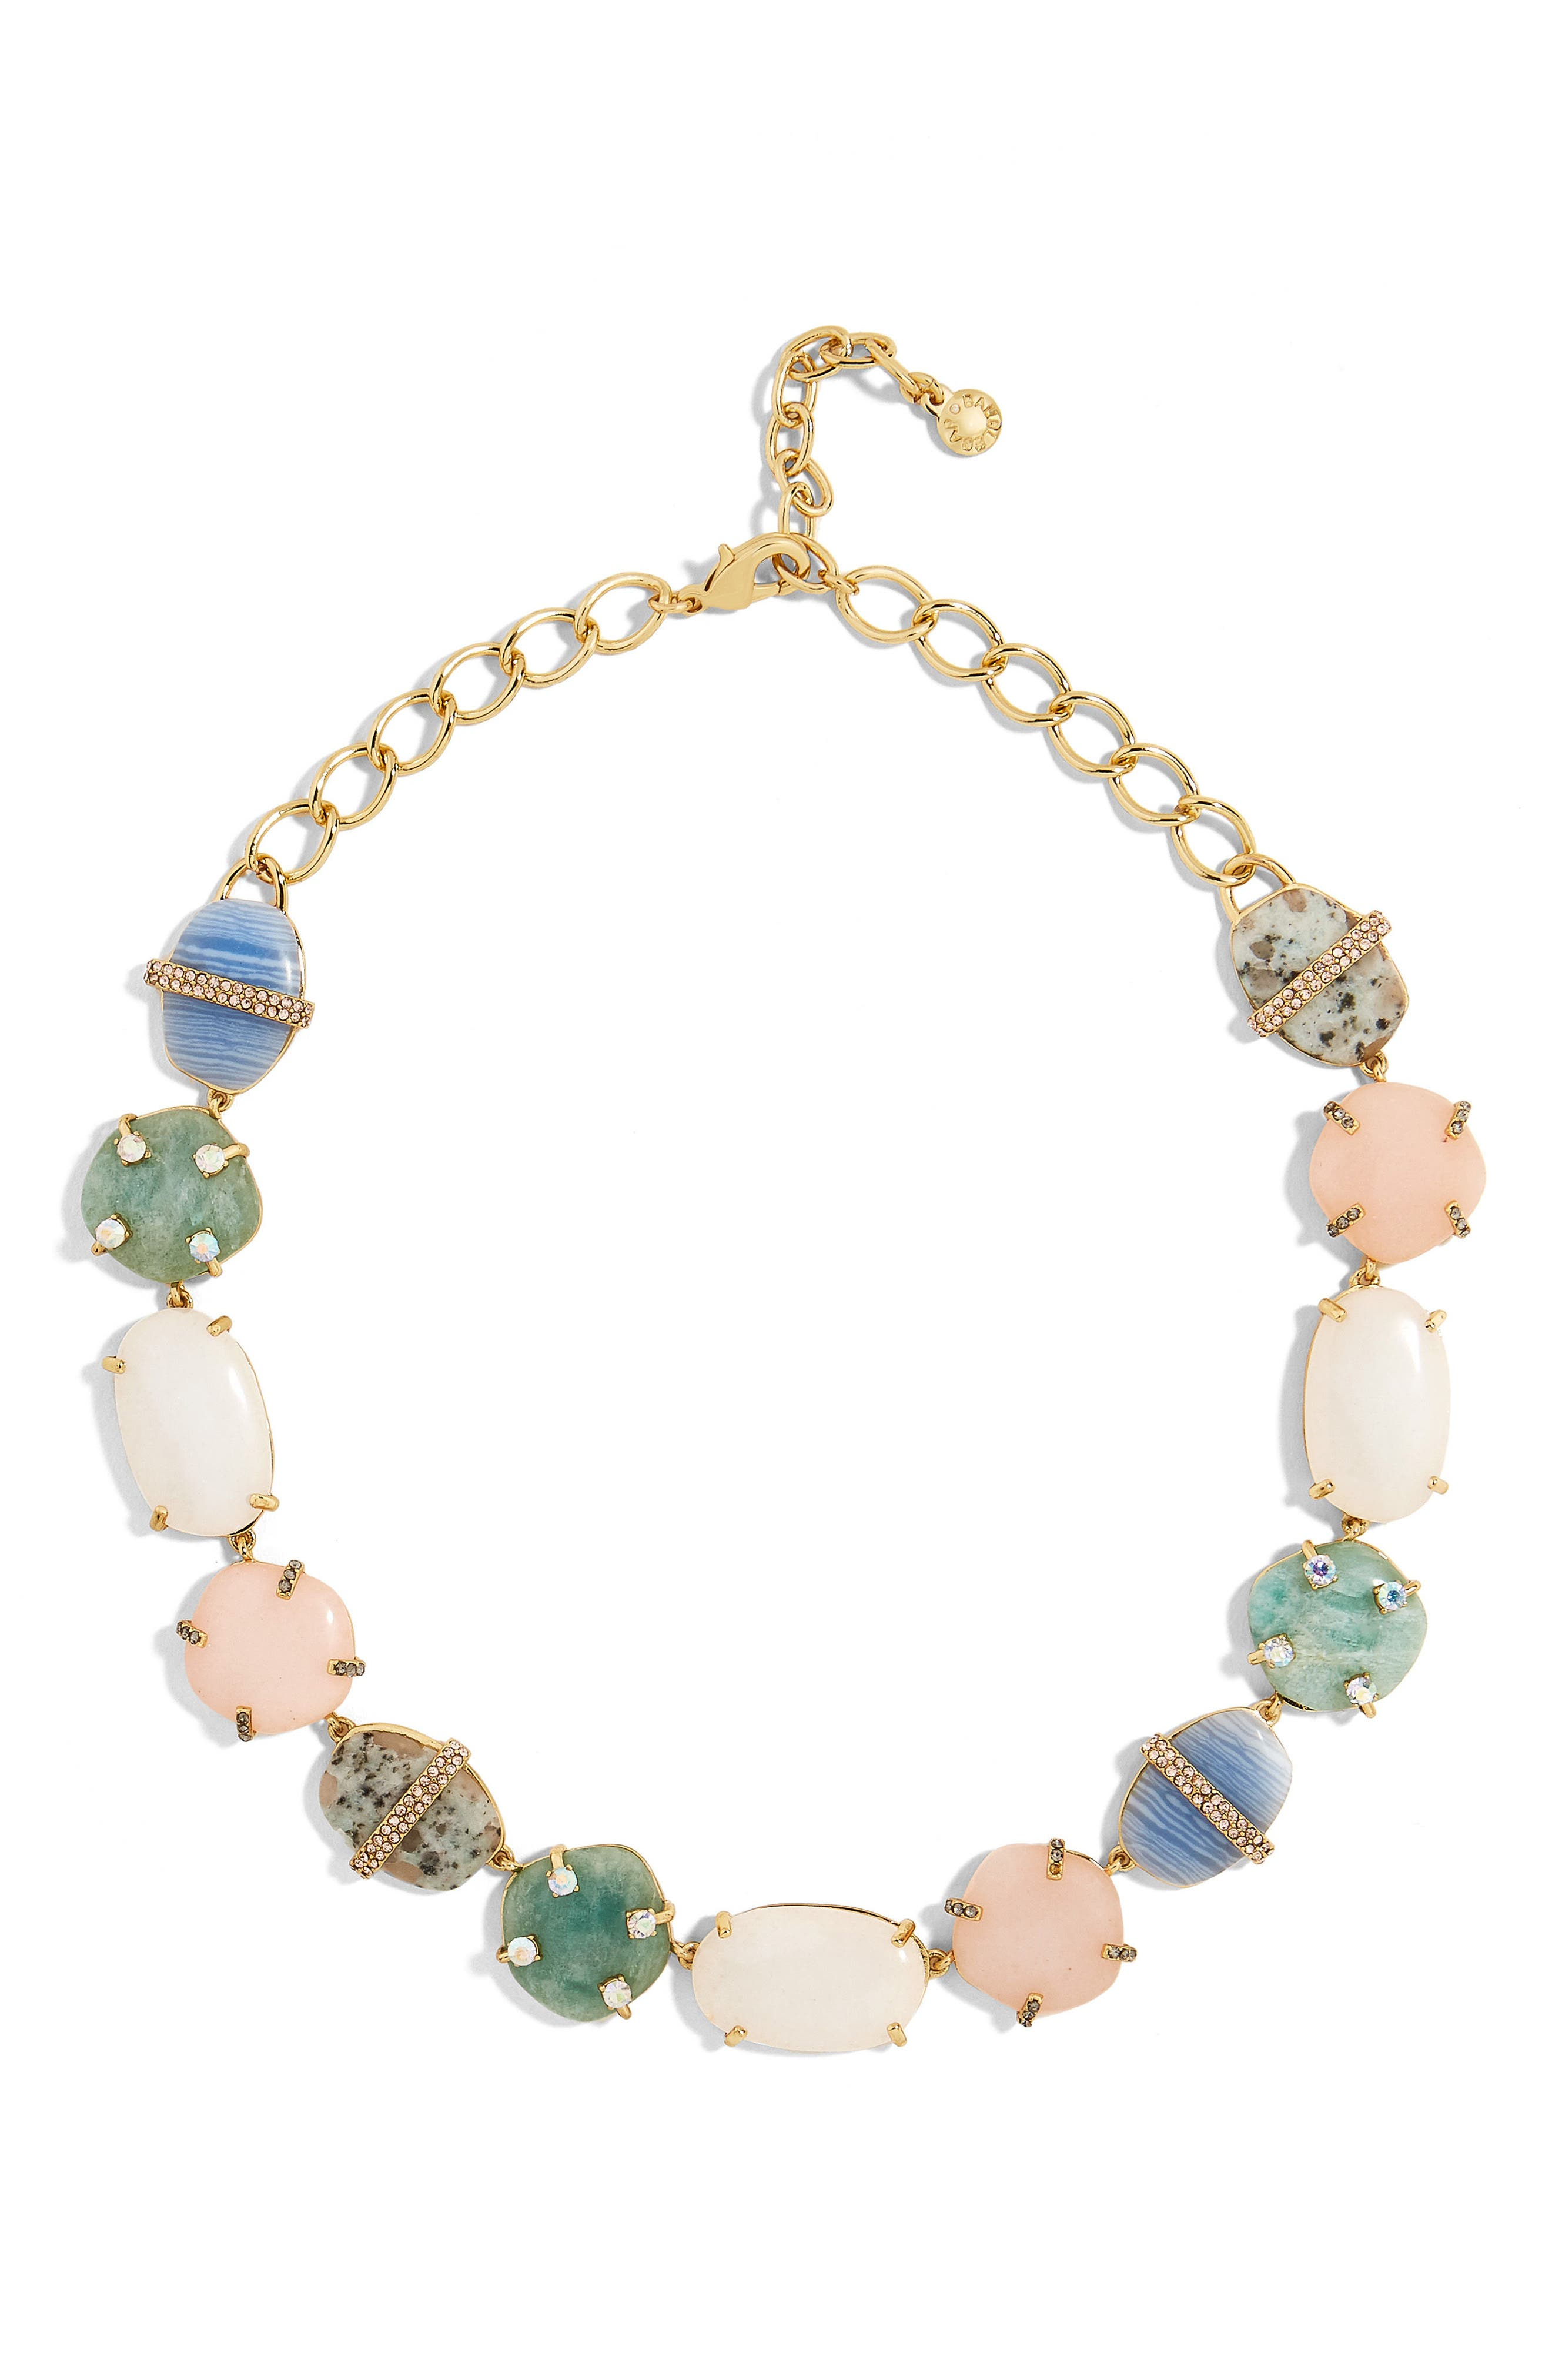 Avianna Collar Necklace,                             Main thumbnail 1, color,                             710